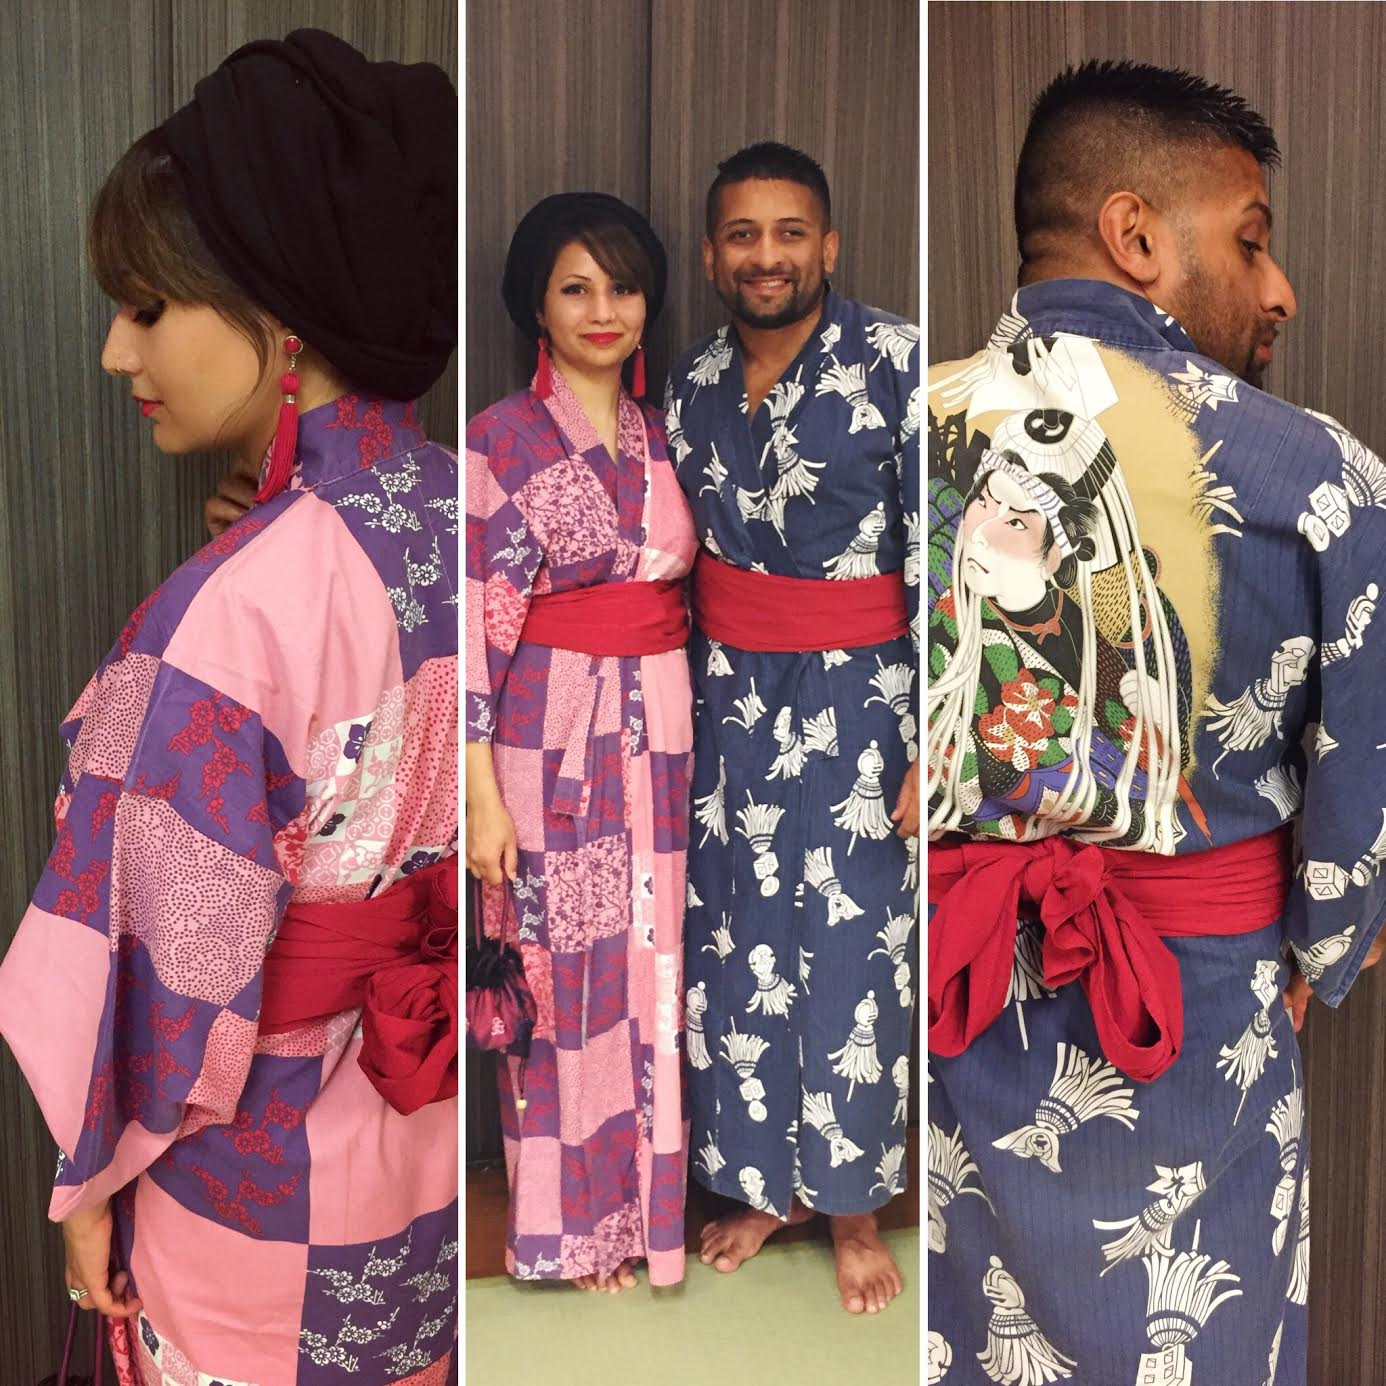 Muslim-travel-tokyo-japan-rent-kimonos.jpg